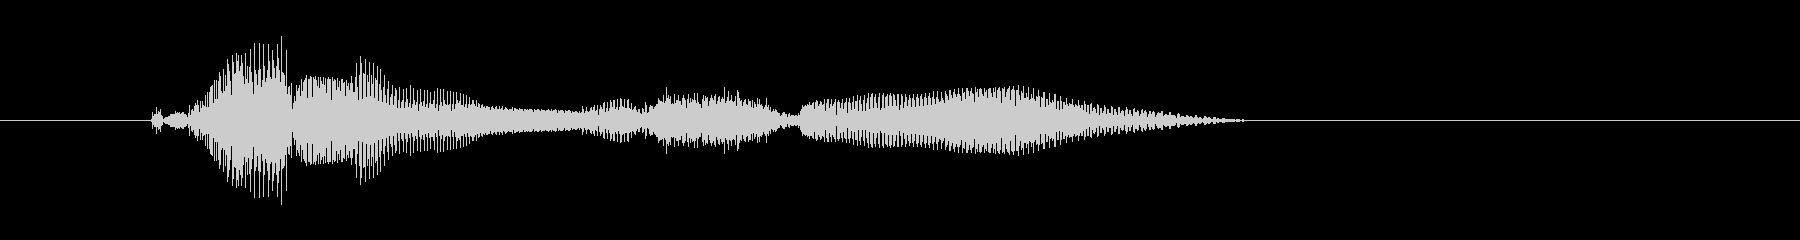 Coming soon…の未再生の波形